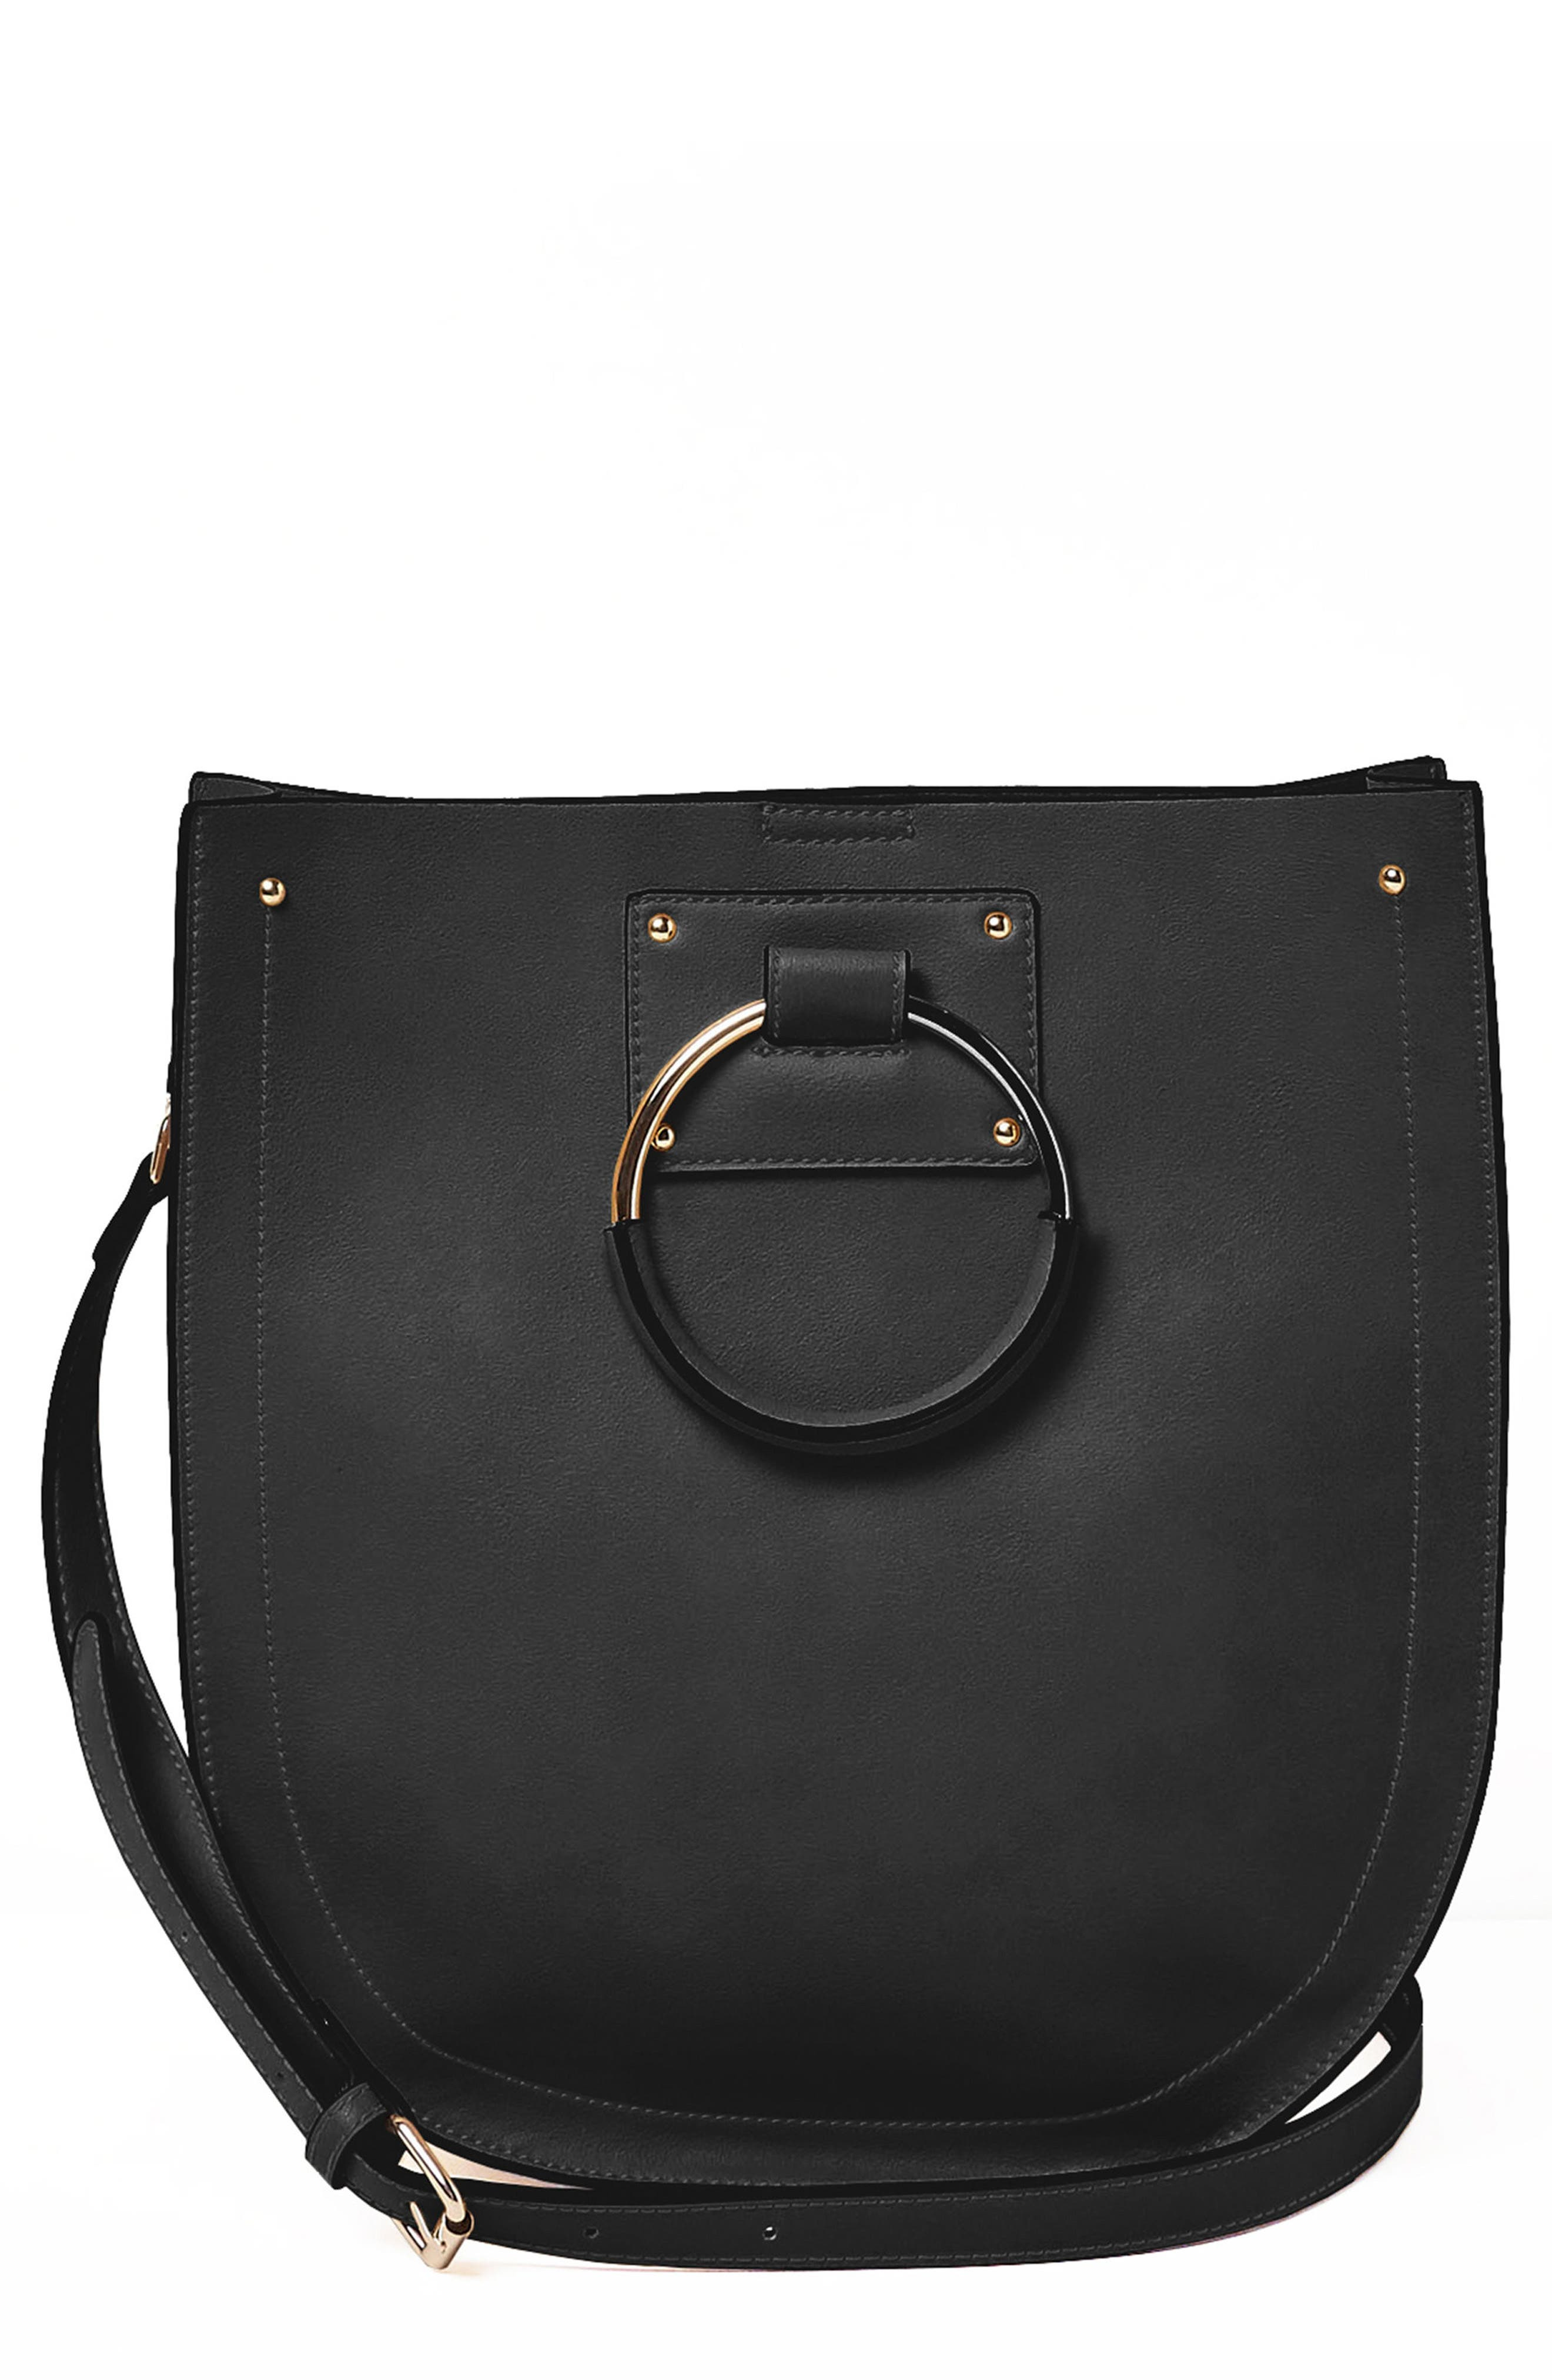 Nordic Dream Vegan Leather Shoulder Bag,                             Main thumbnail 1, color,                             001